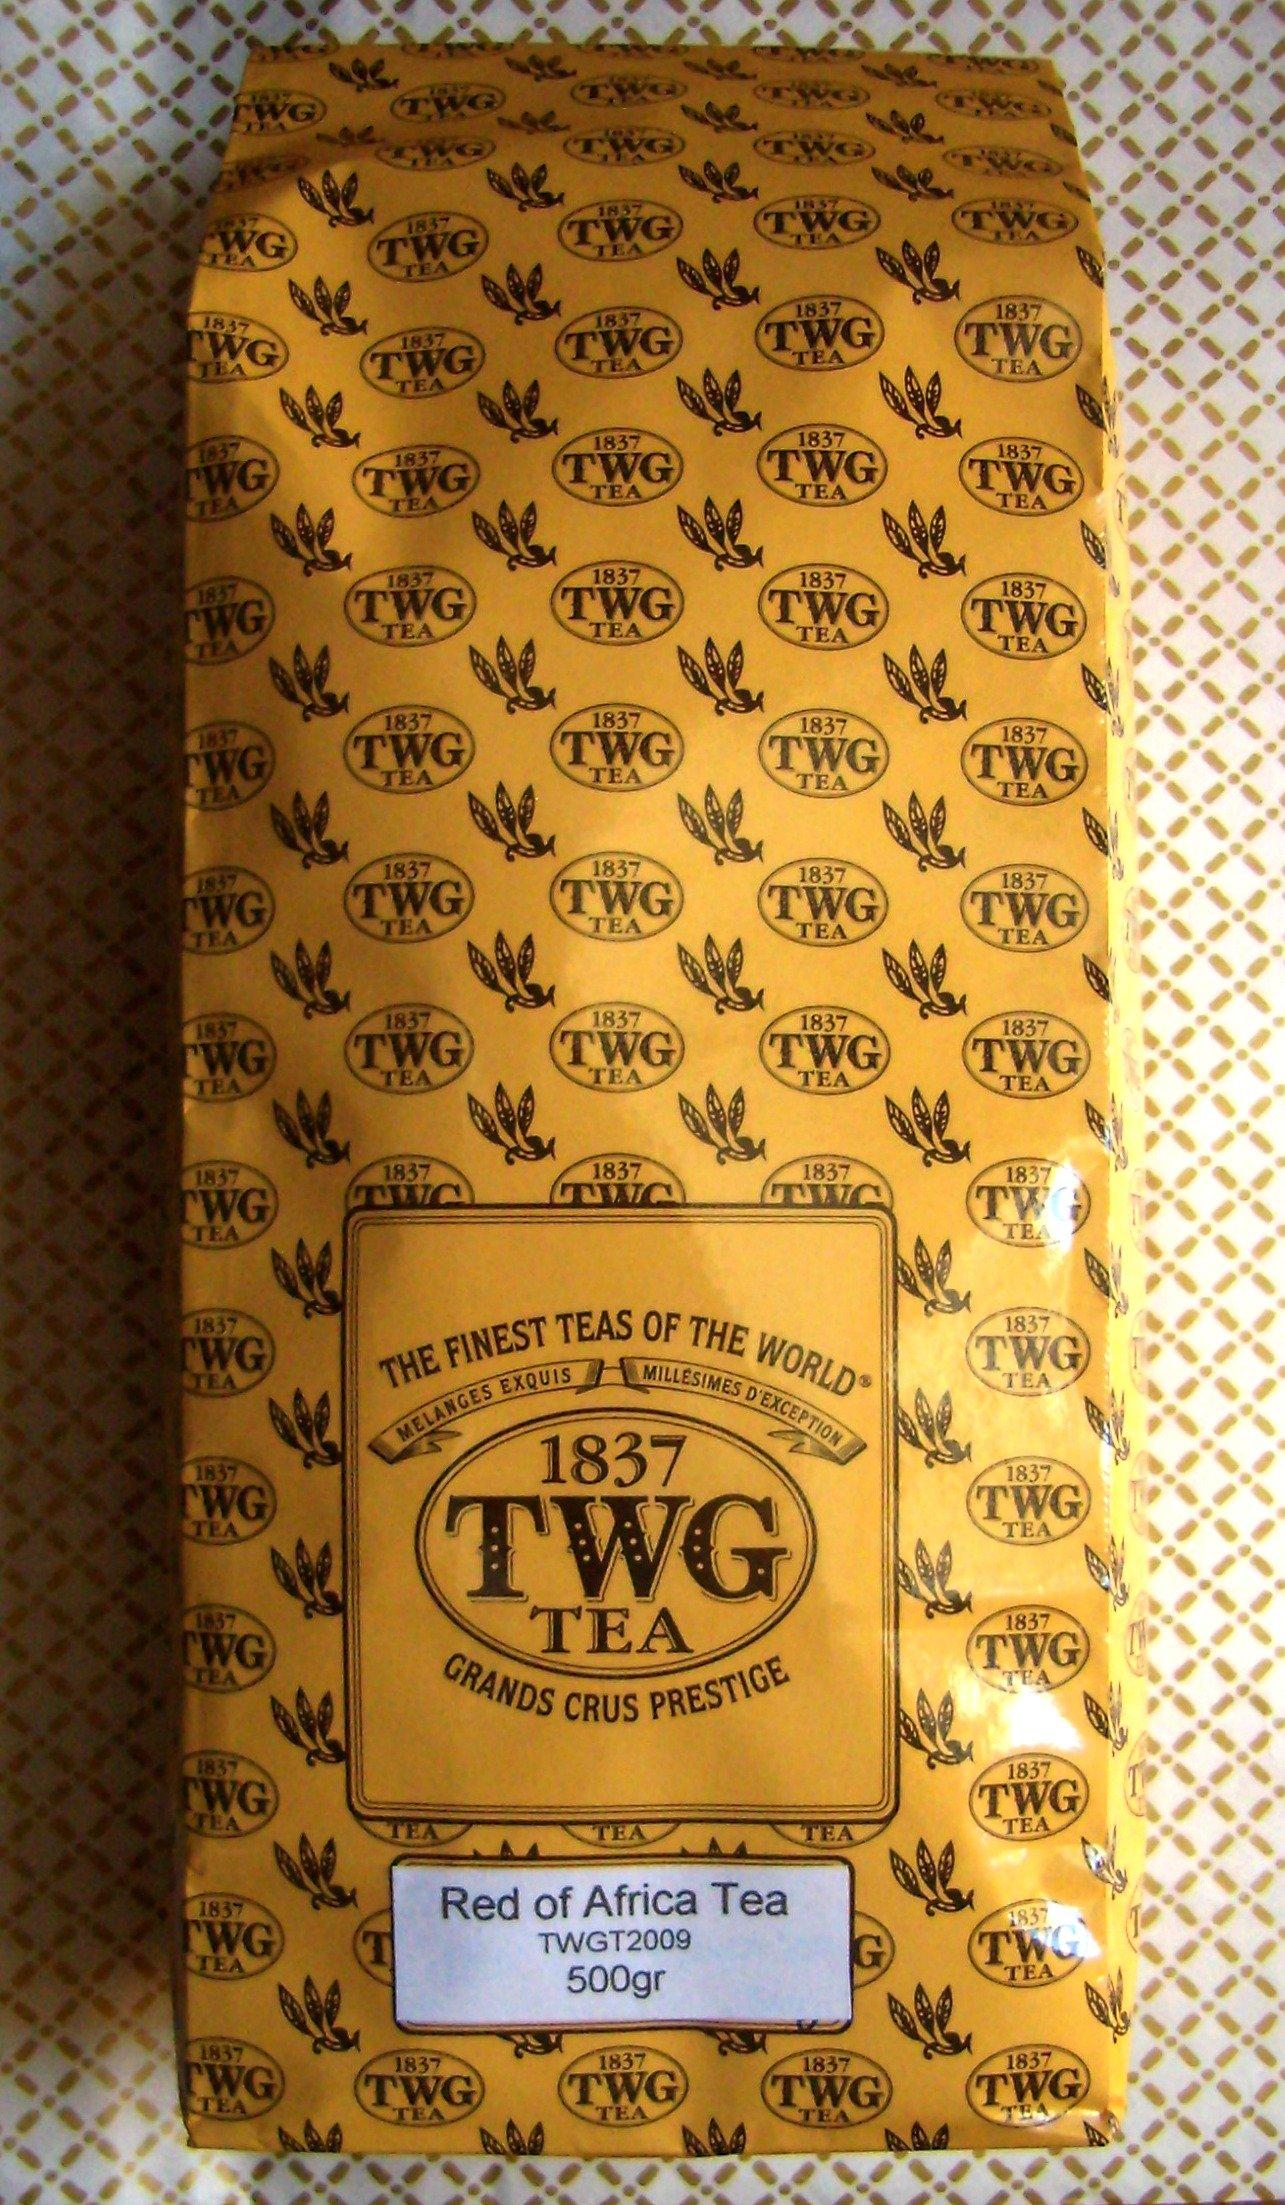 TWG Tea - Red of Africa Tea (TWGT2009) - 17.63oz / 500gr Loose Leaf BULK BAG